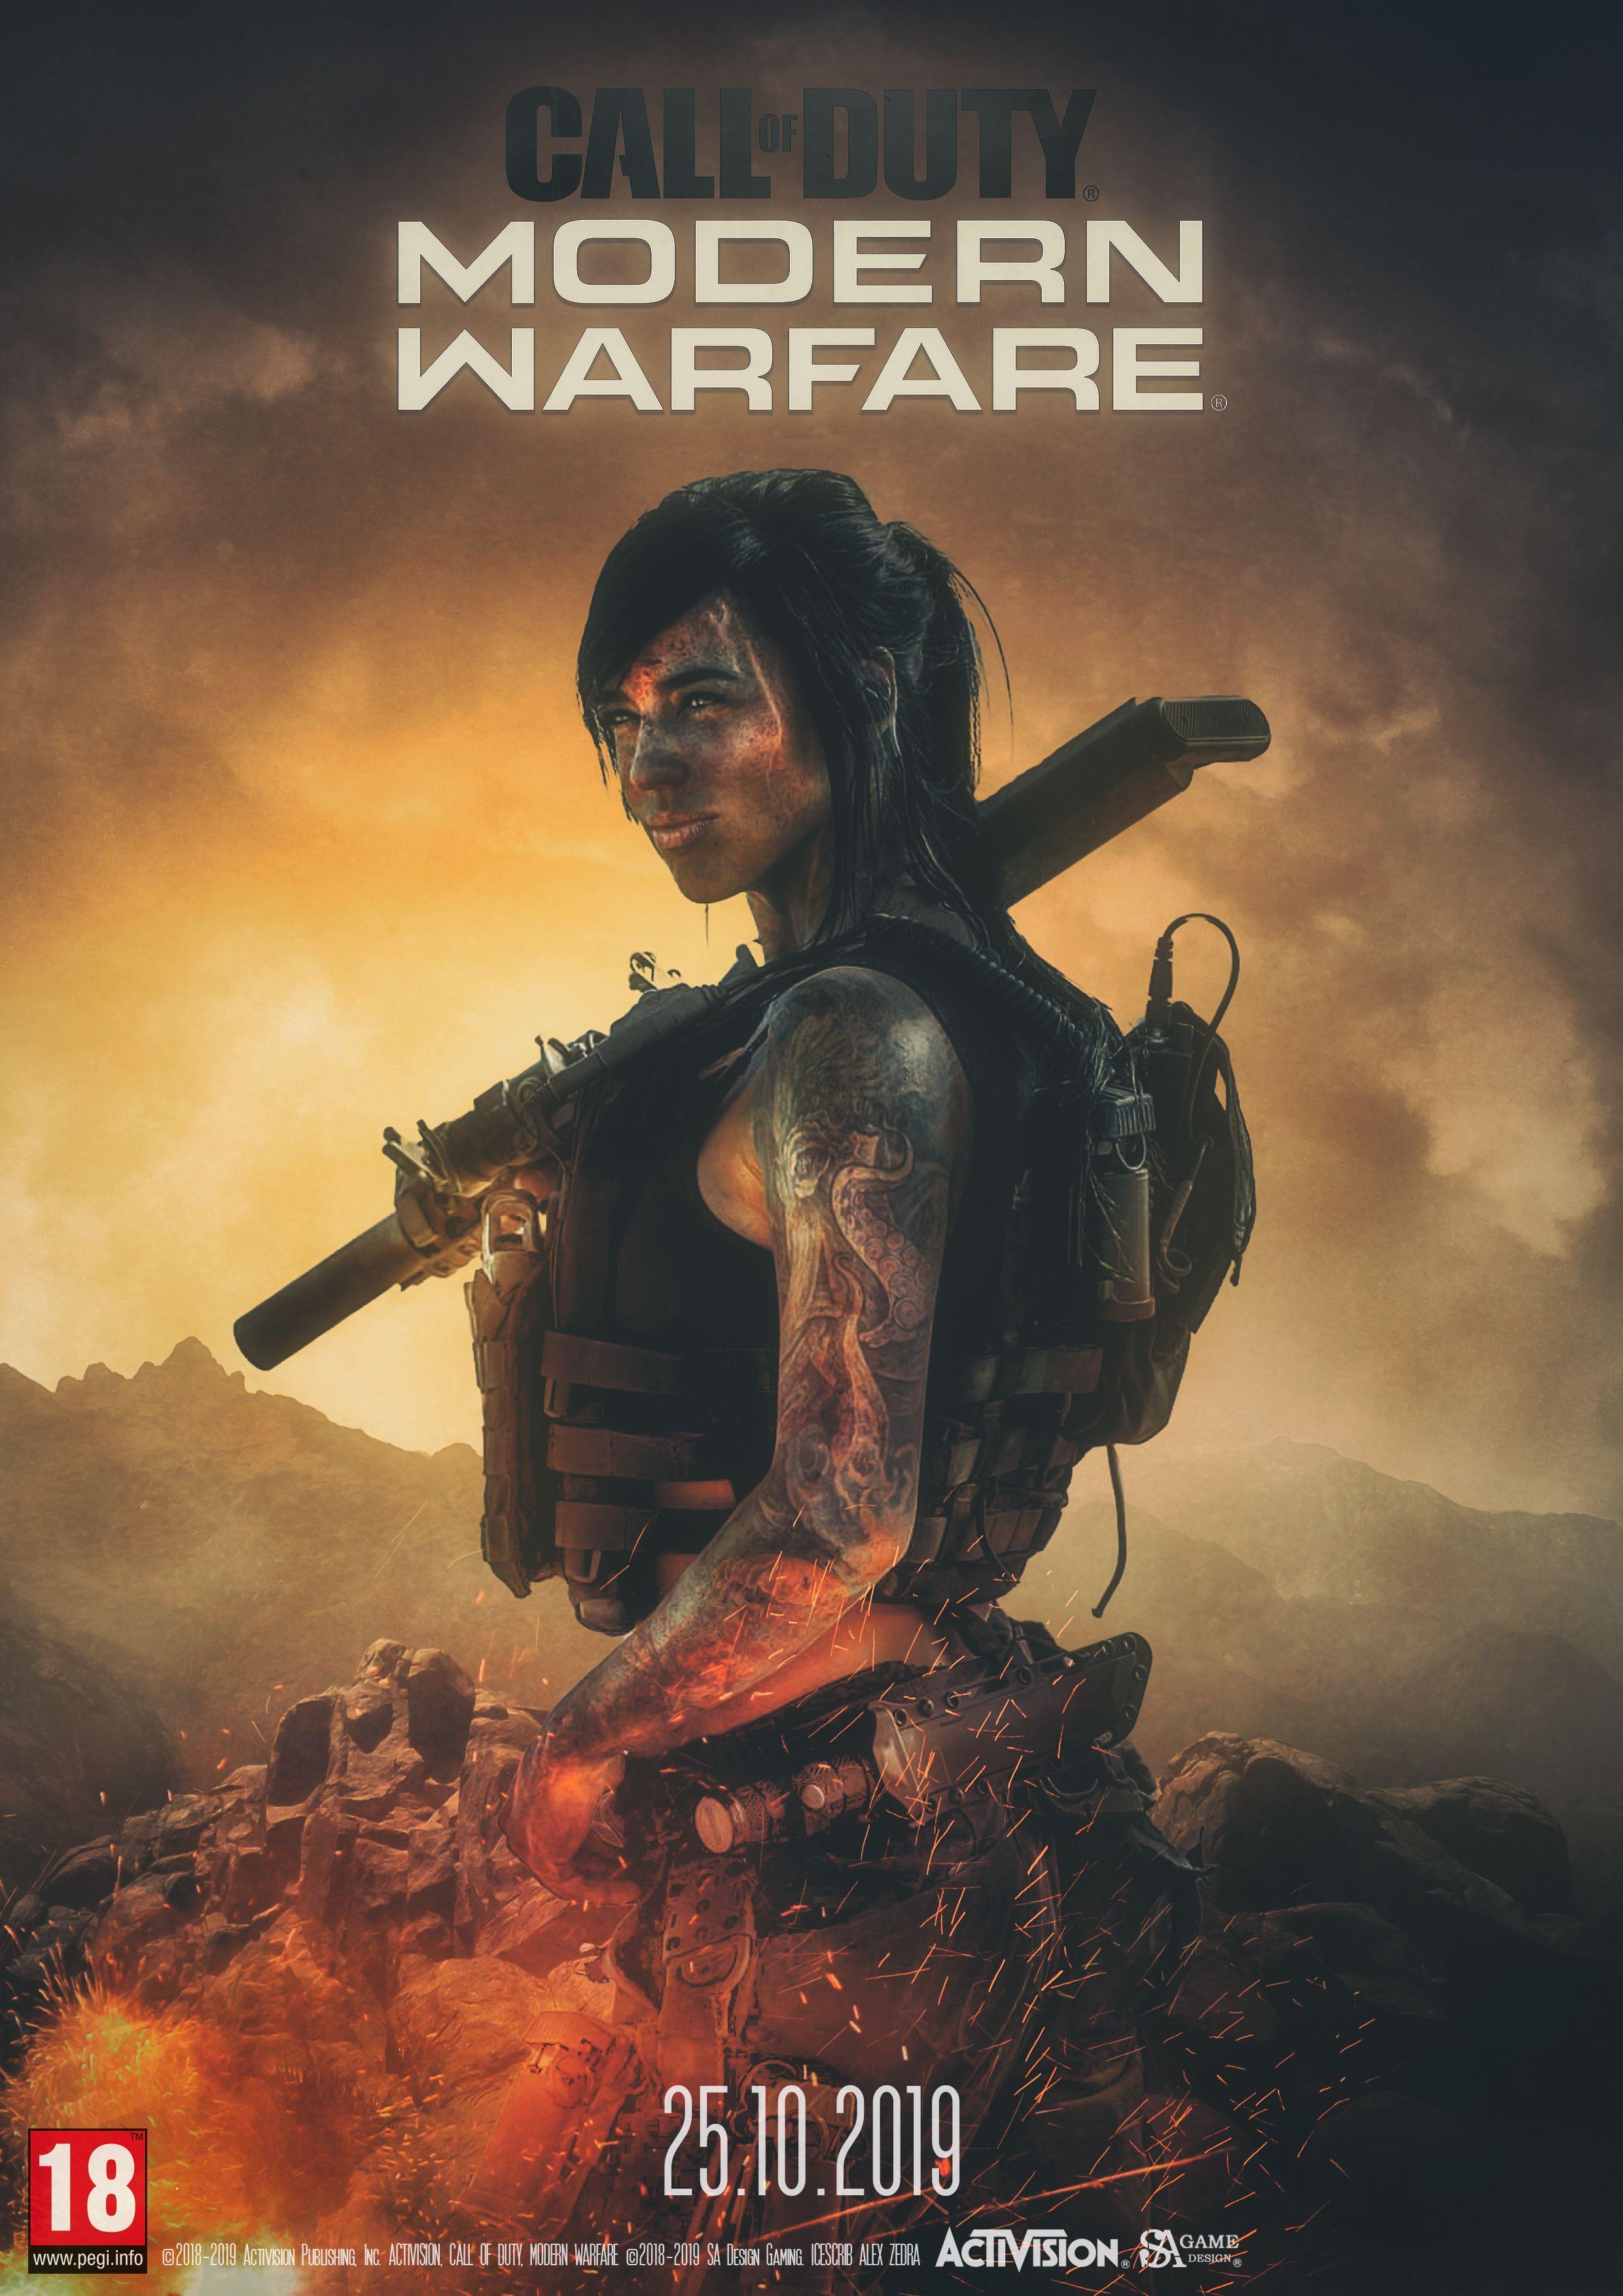 Pin By Levi Macias On Call Of Duty Modern Warfare Alex Zedra Cinema Art